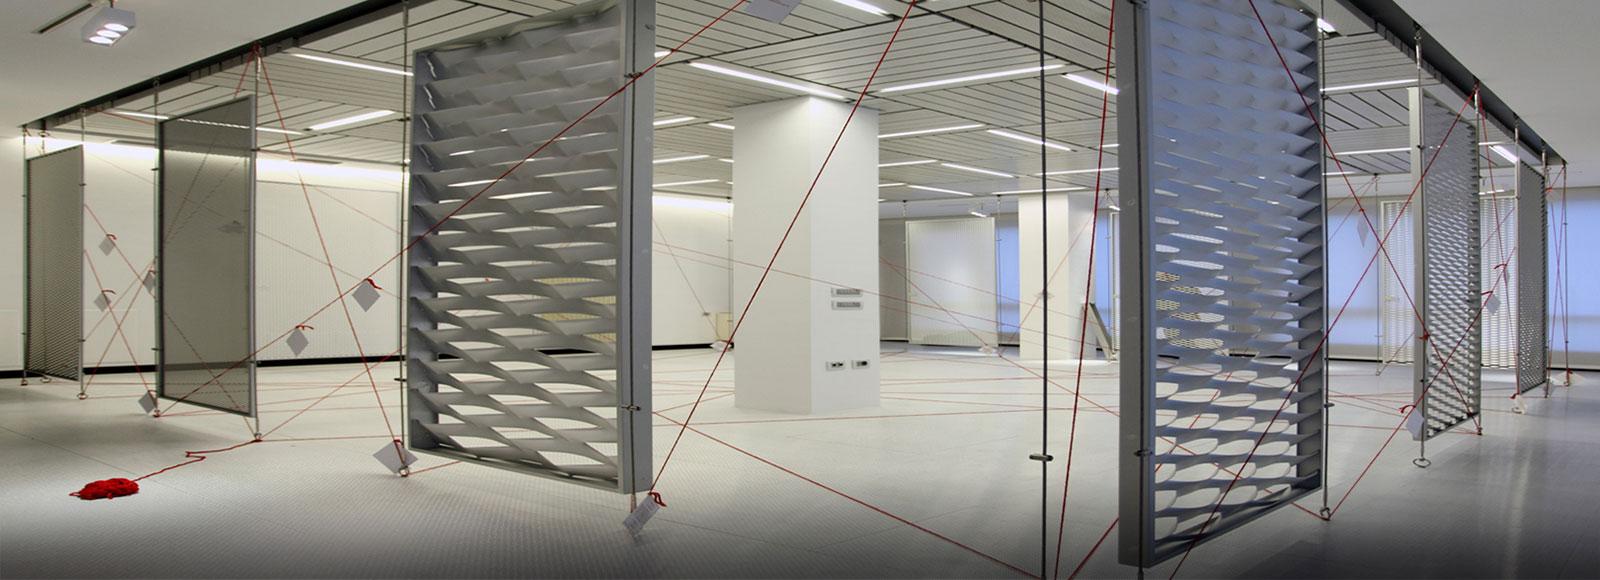 Showroom Fils per Industria e Architettura